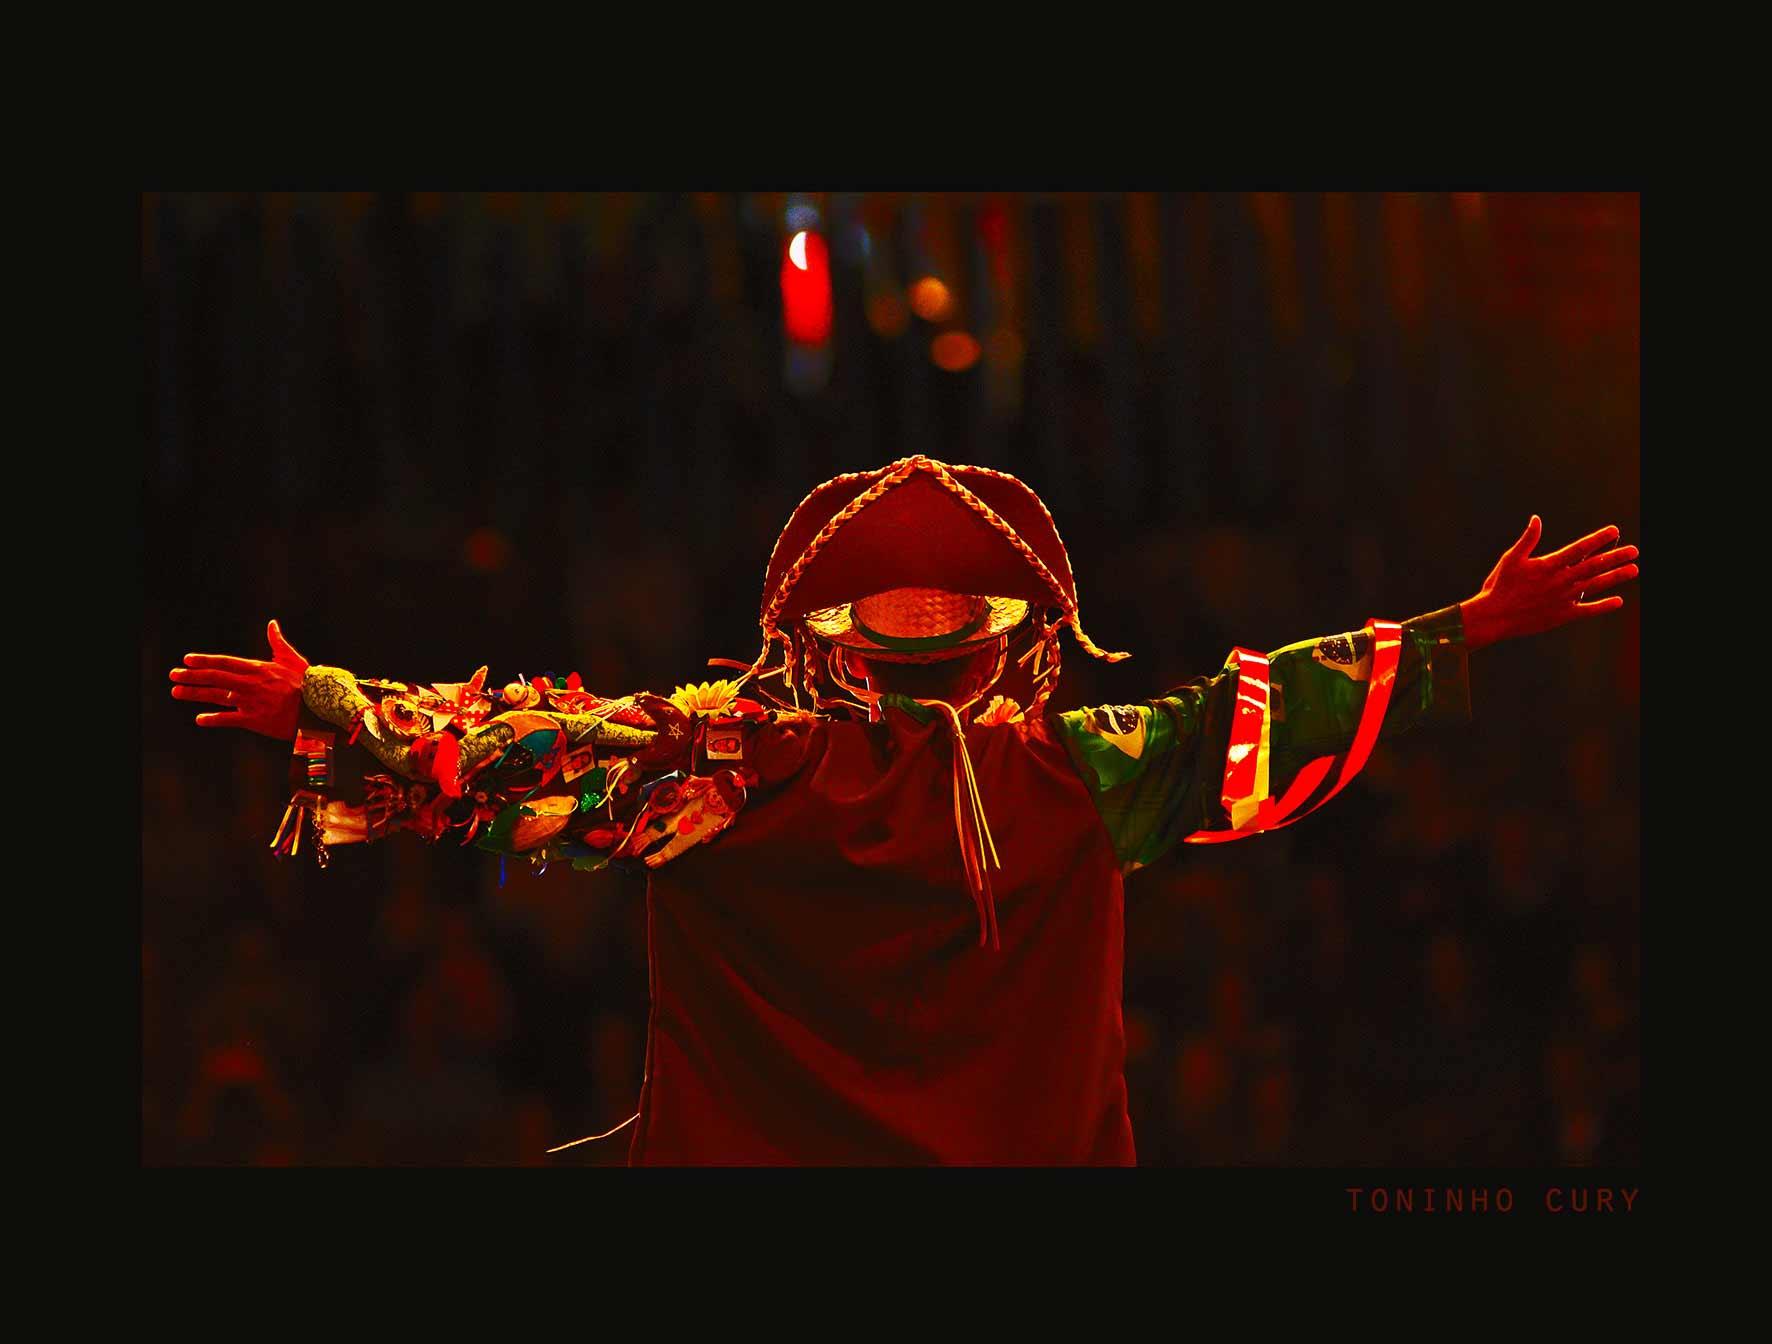 54º Festival do Folclore de Olímpia